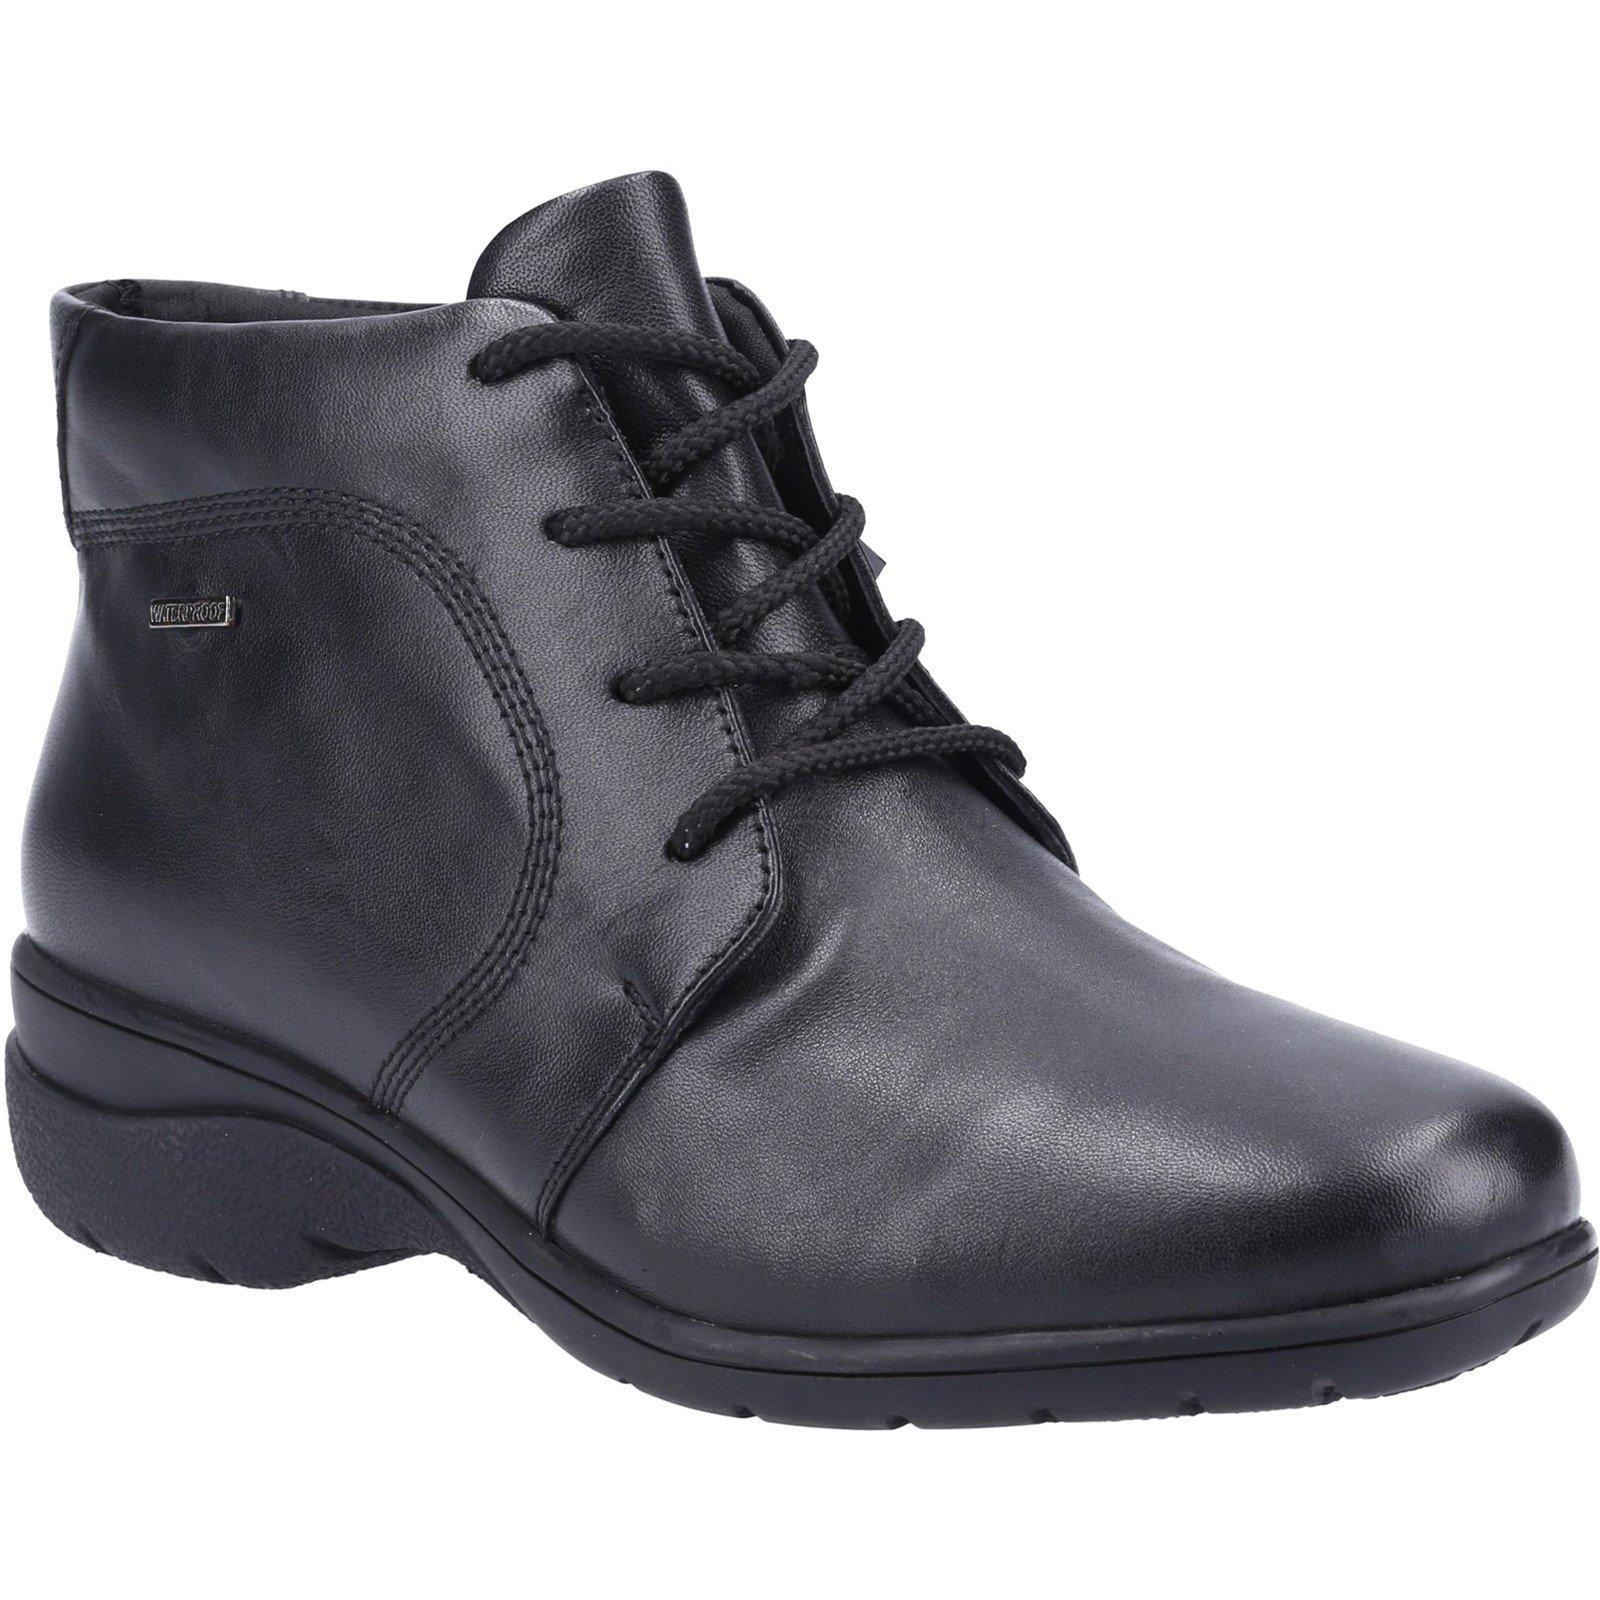 Cotswold Women's Bibury 2 Ankle Boot Black 32978 - Black 6